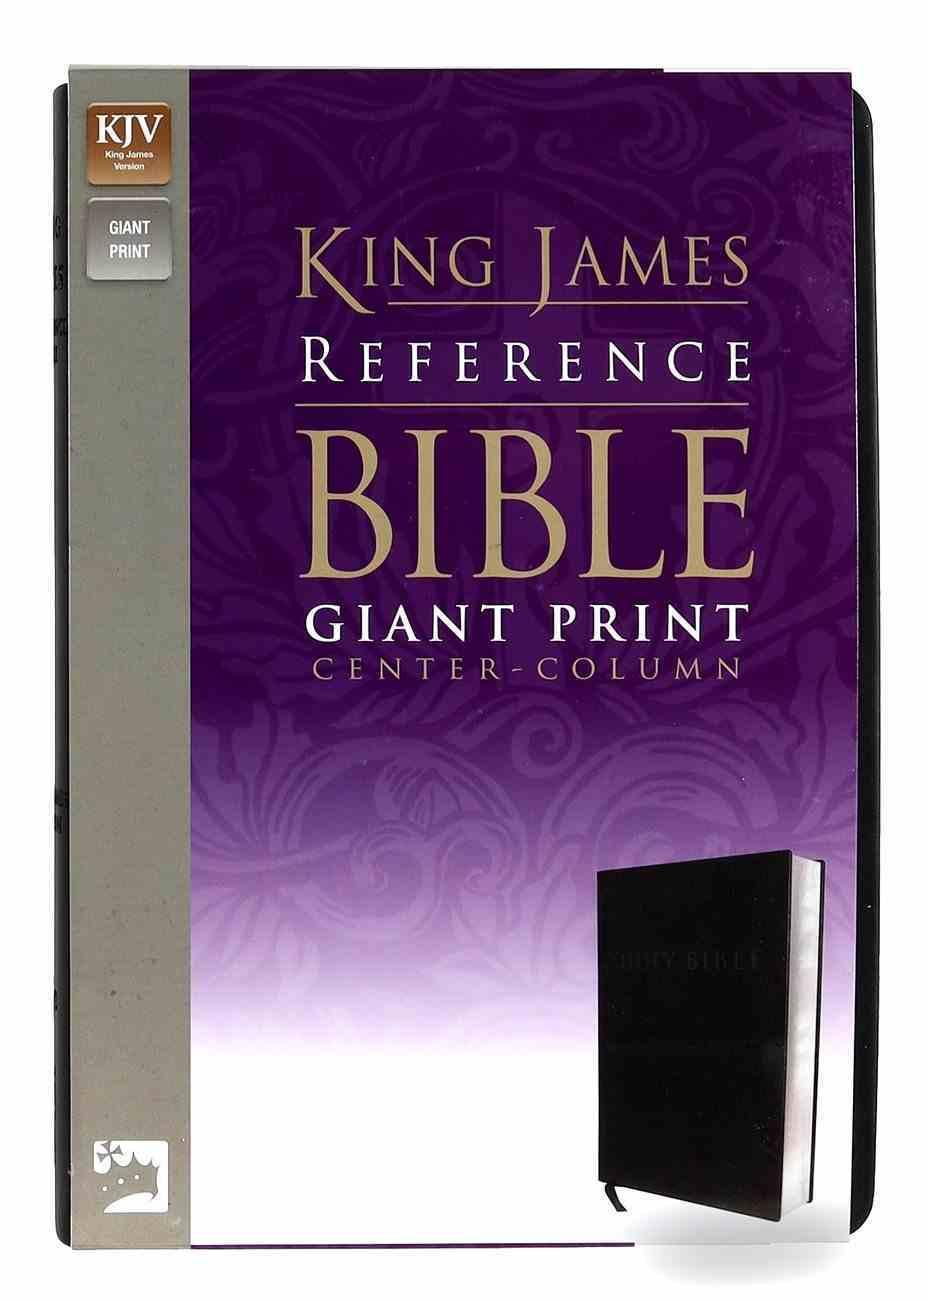 KJV Giant Print Reference Bible Black Premium Imitation Leather